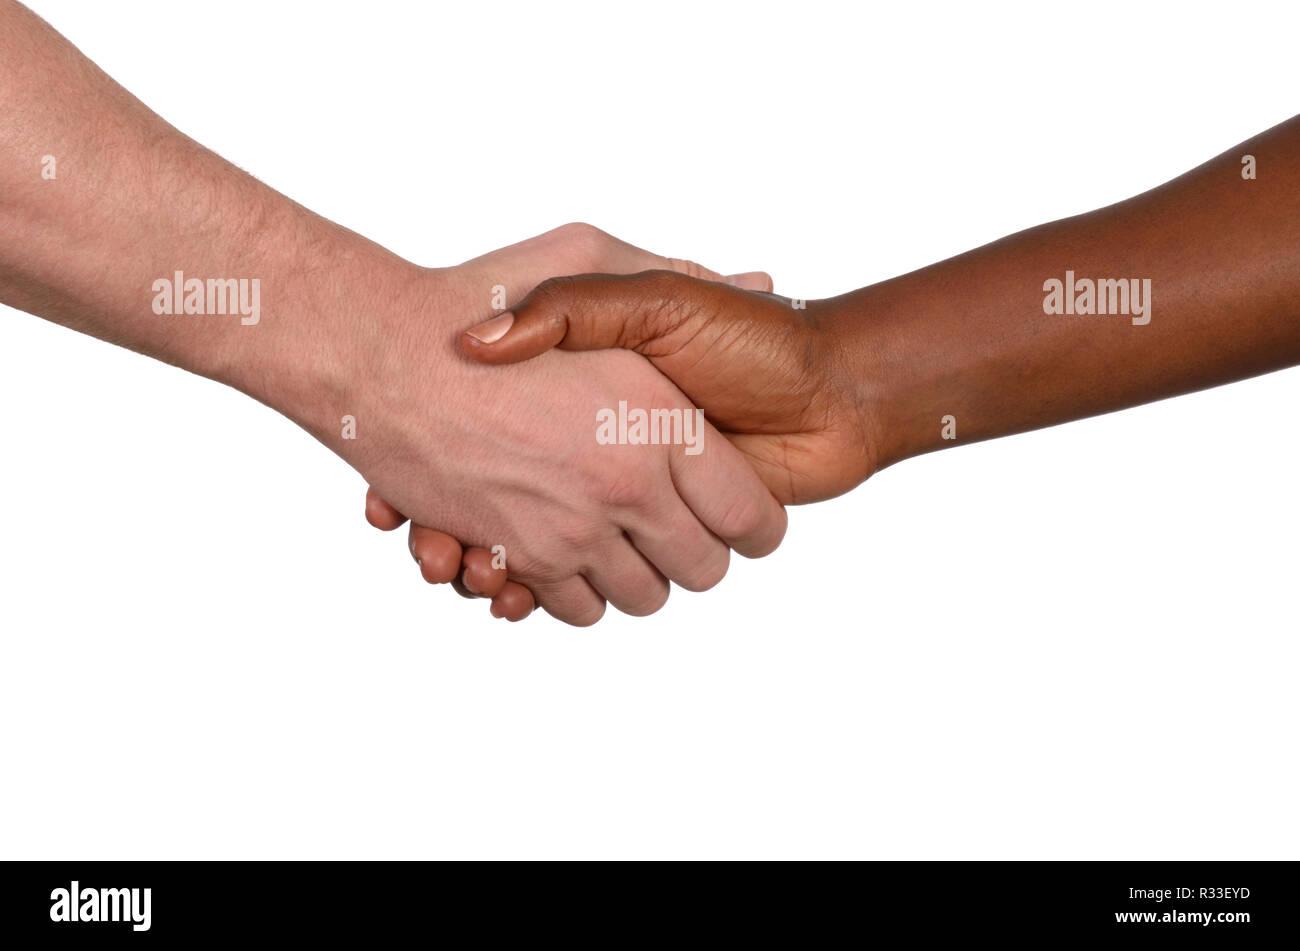 shaking hands internationally - Stock Image